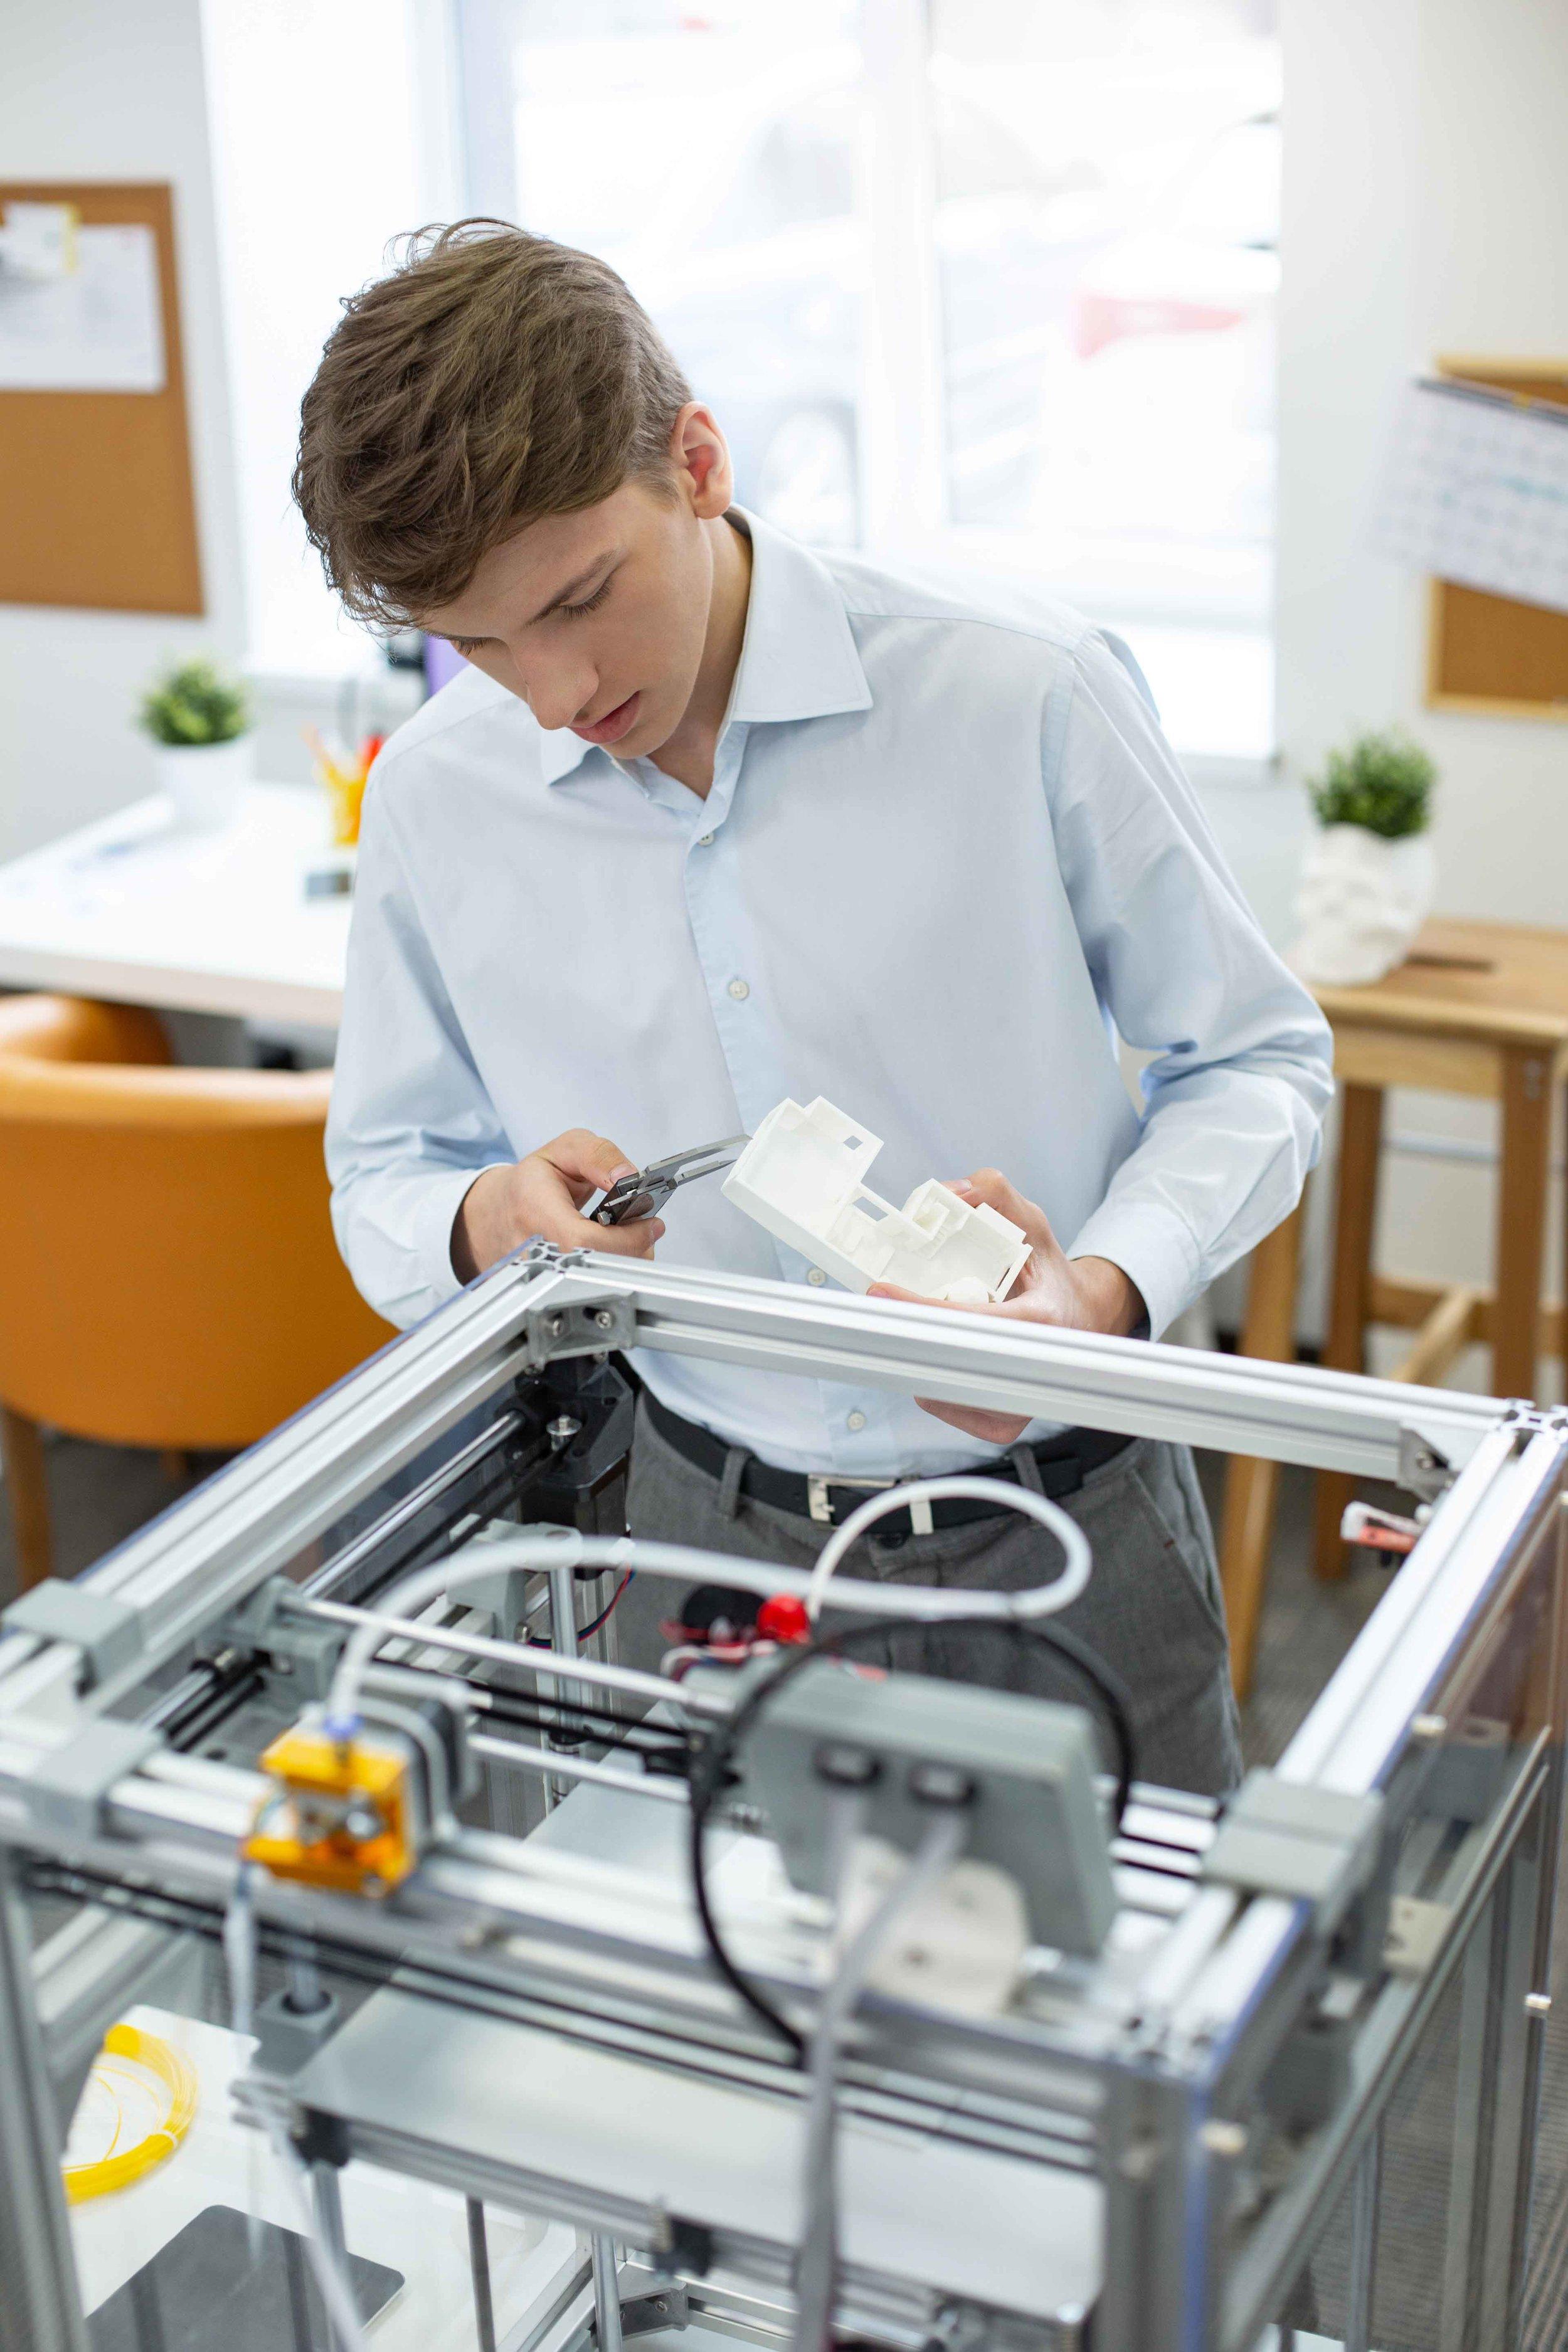 INDEPENDENT SCHOOL ROBOTICS 3D PRINTER